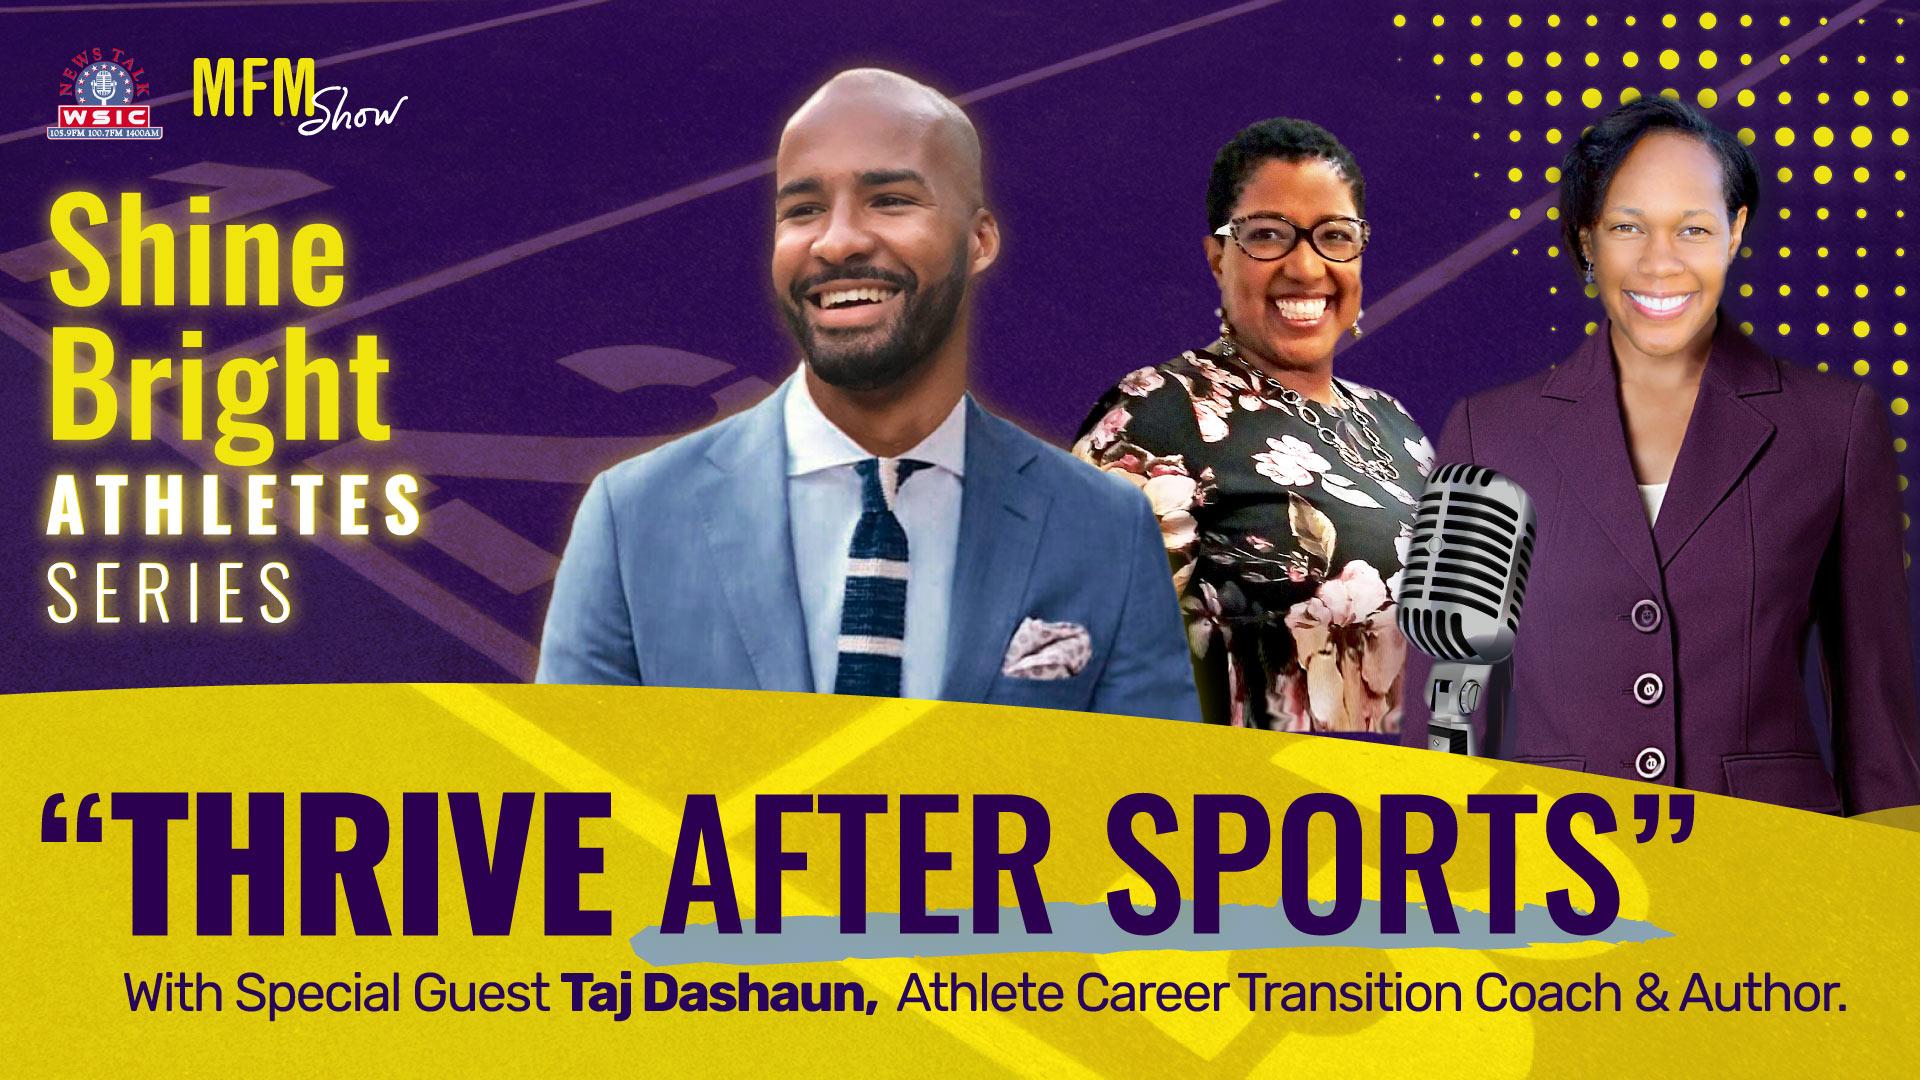 Thrive After Sports with Taj Dashaun